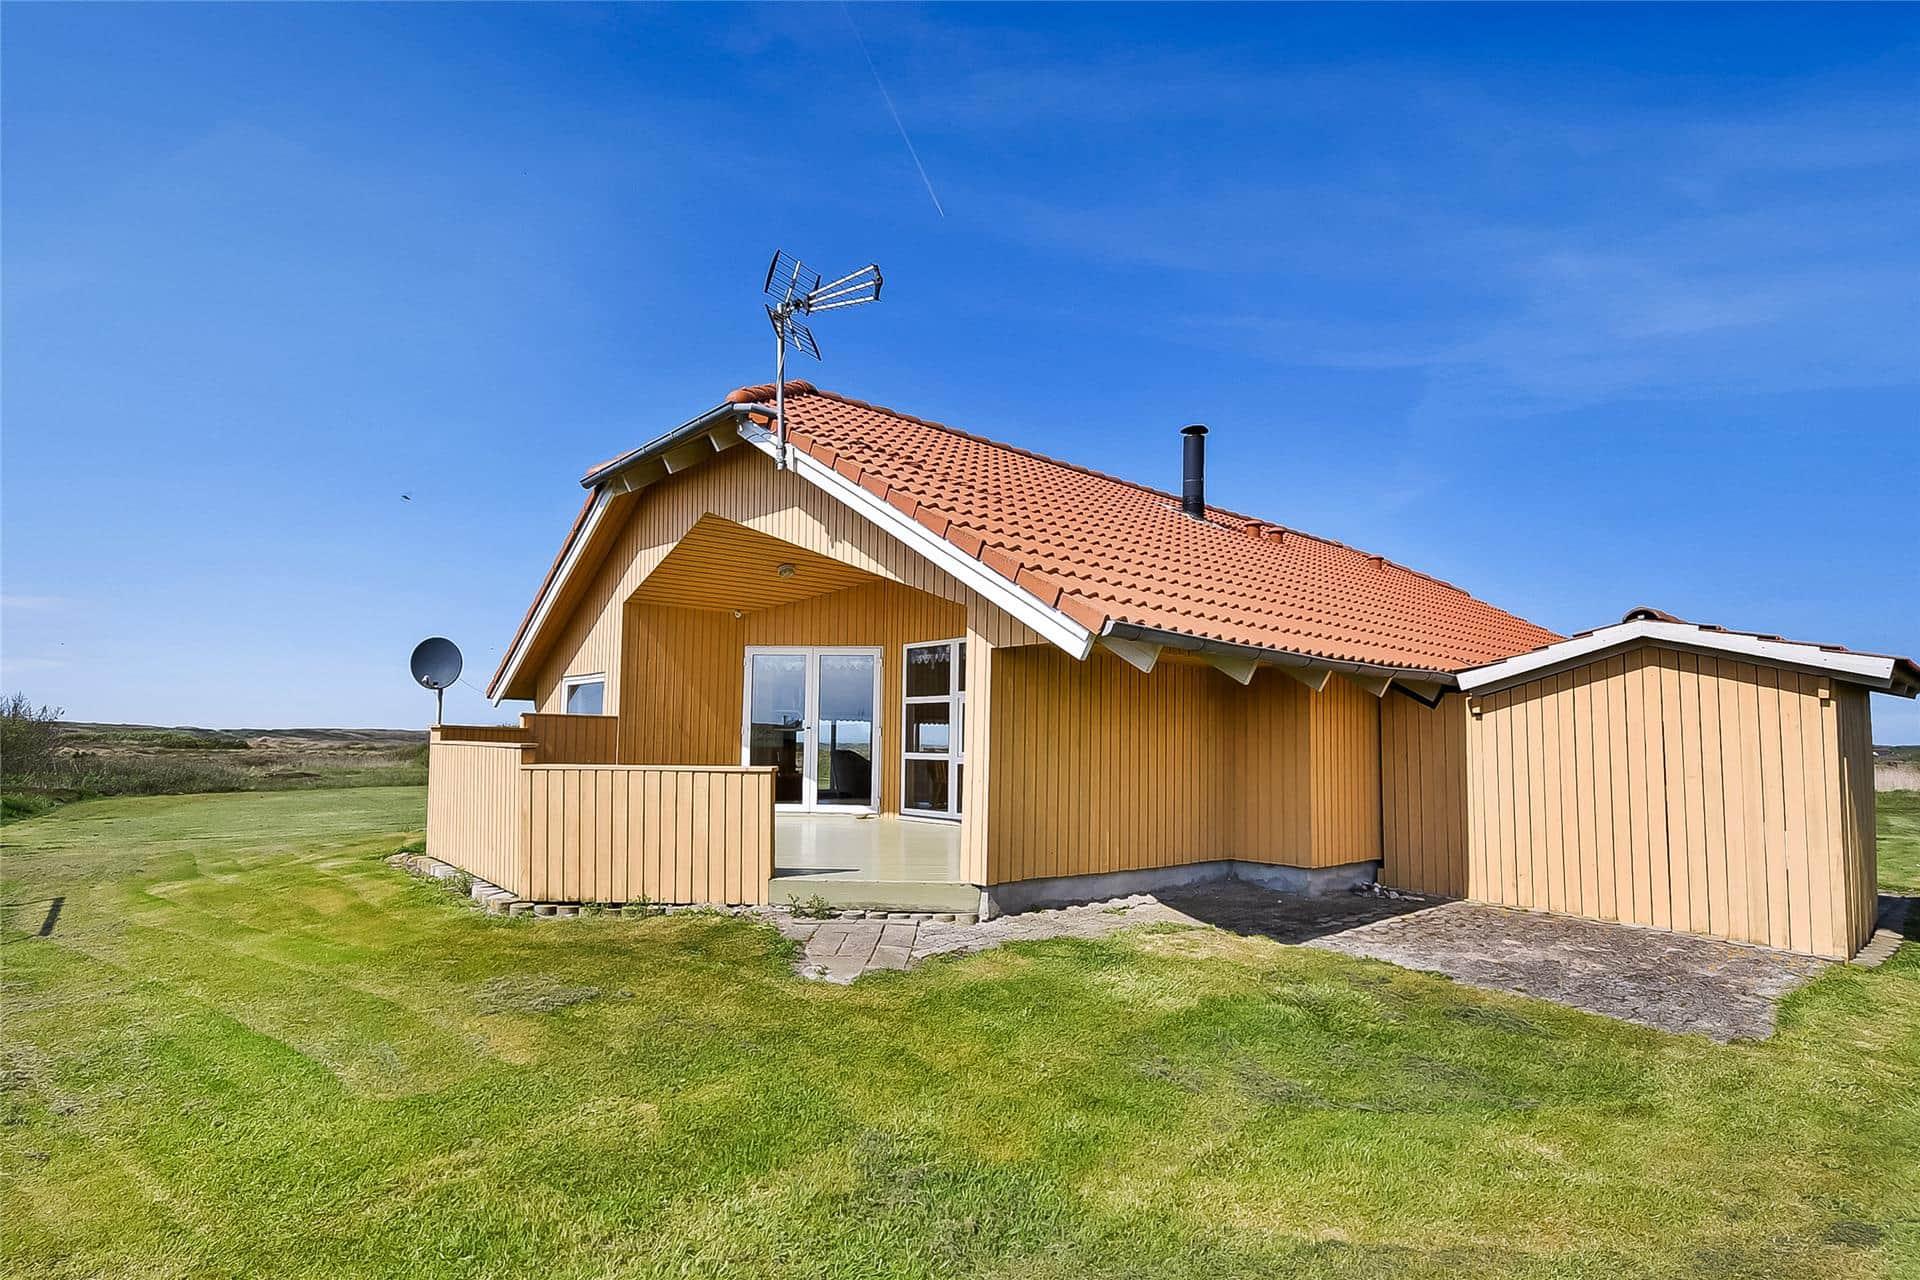 Bild 1-20 Ferienhaus 514, Lyngsletten 60, DK - 7620 Lemvig